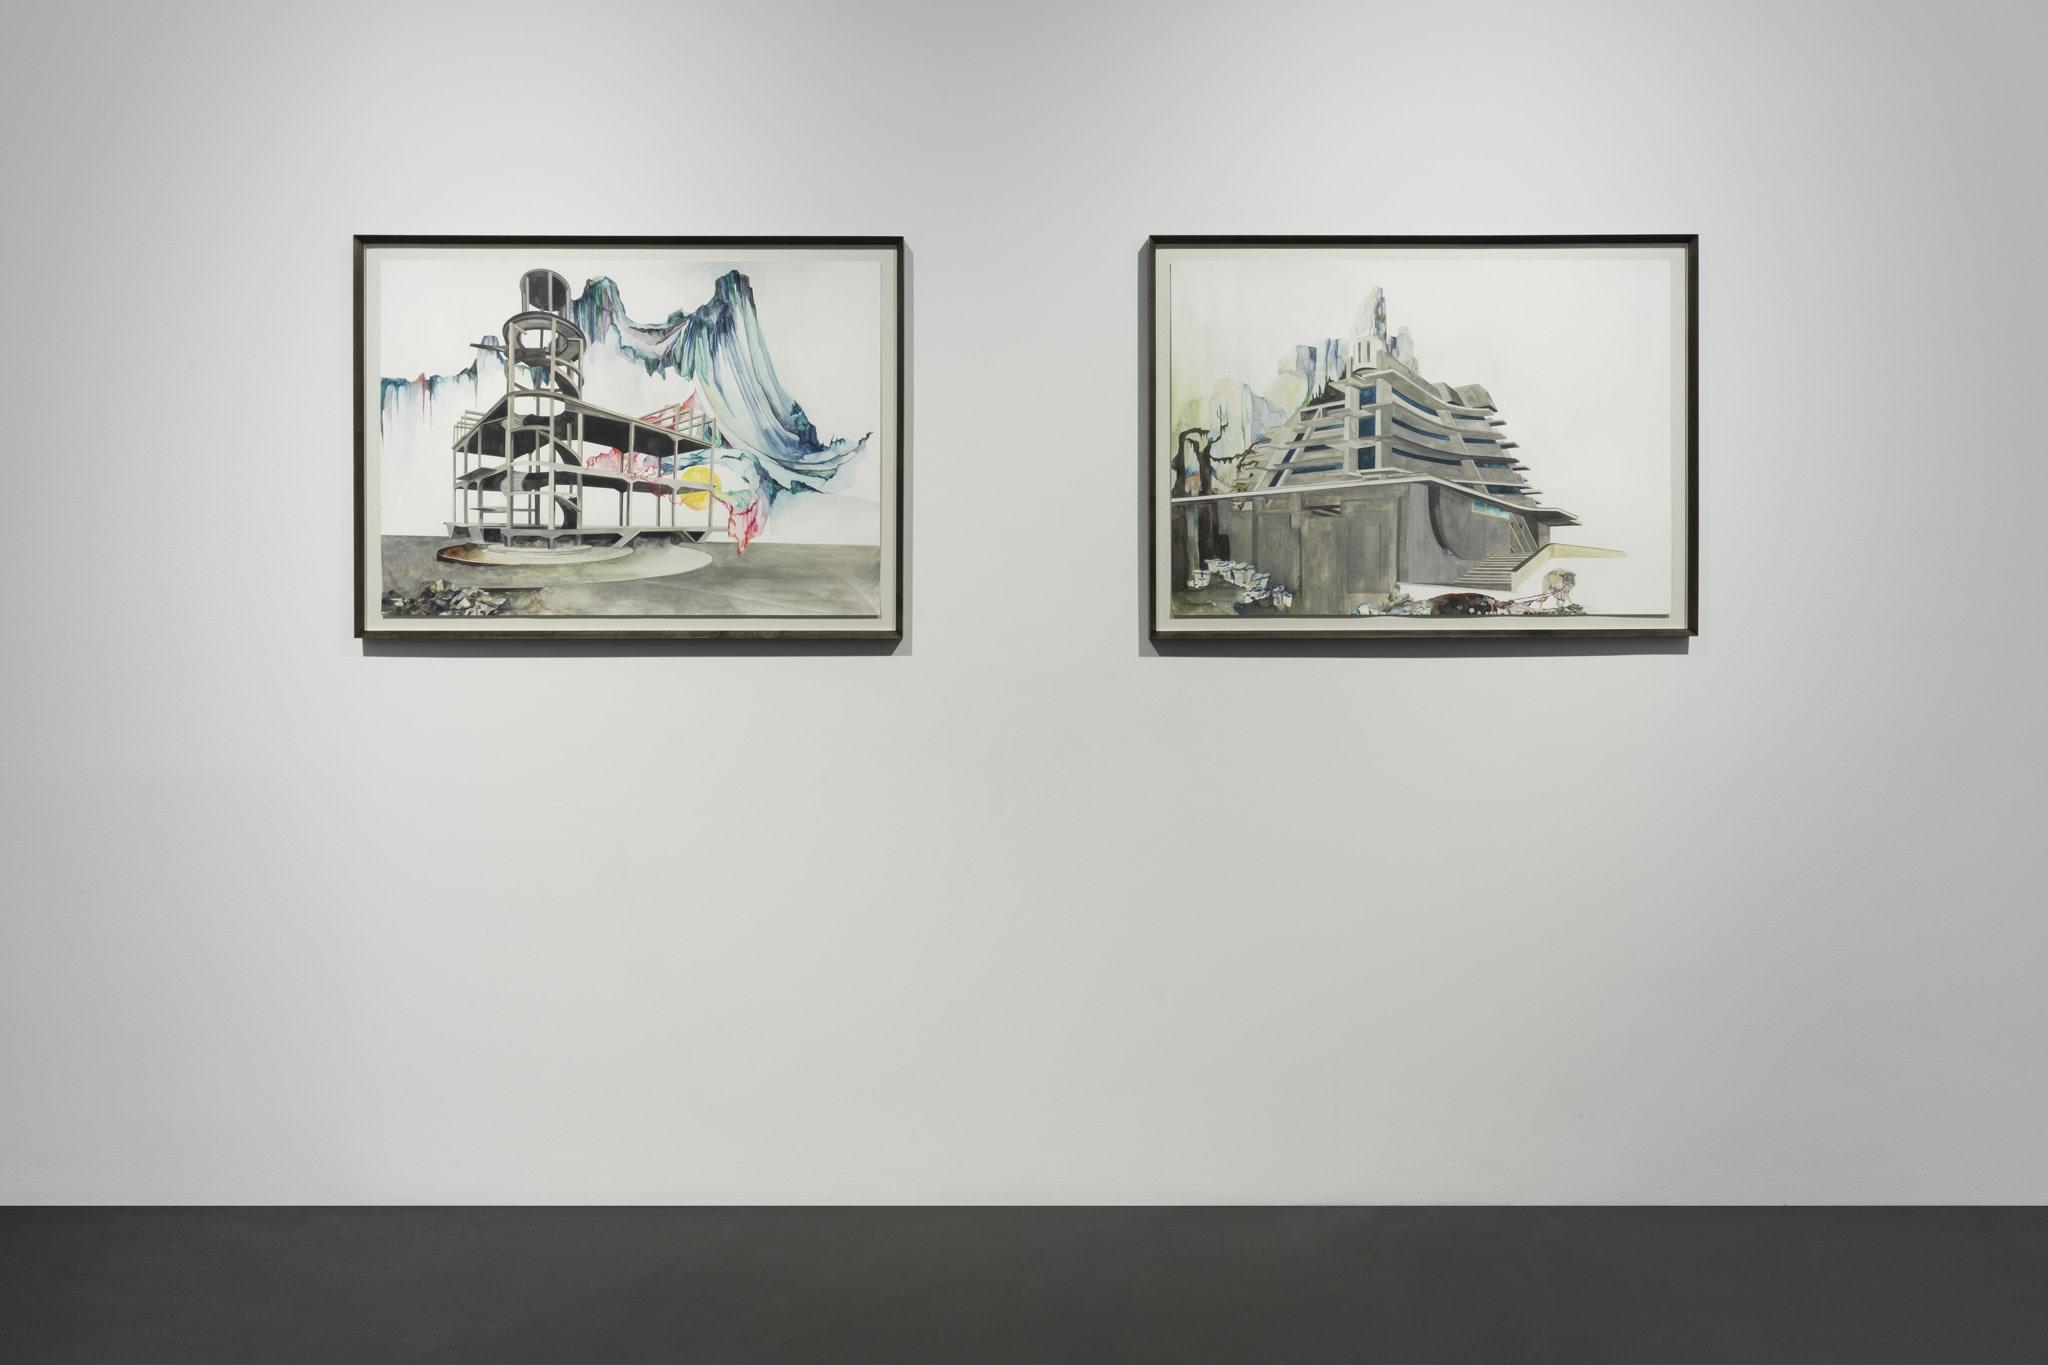 From left to right: Isa Melsheimer, Nr. 473, 2021, gouache on paper, 70 x 100 cm (27 1/2 x 39 3/8 in) (unframed), 79 x 109 x 4 cm (31 1/8 x 42 7/8 x 1 5/8 in) (framed); Nr. 472, 2021, gouache on paper, 70 x 100 cm (27 1/2 x 39 3/8 in) (unframed), 79 x 109 x 4 cm (31 1/8 x 42 7/8 x 1 5/8 in) (framed). Photo © Andrea Rossetti